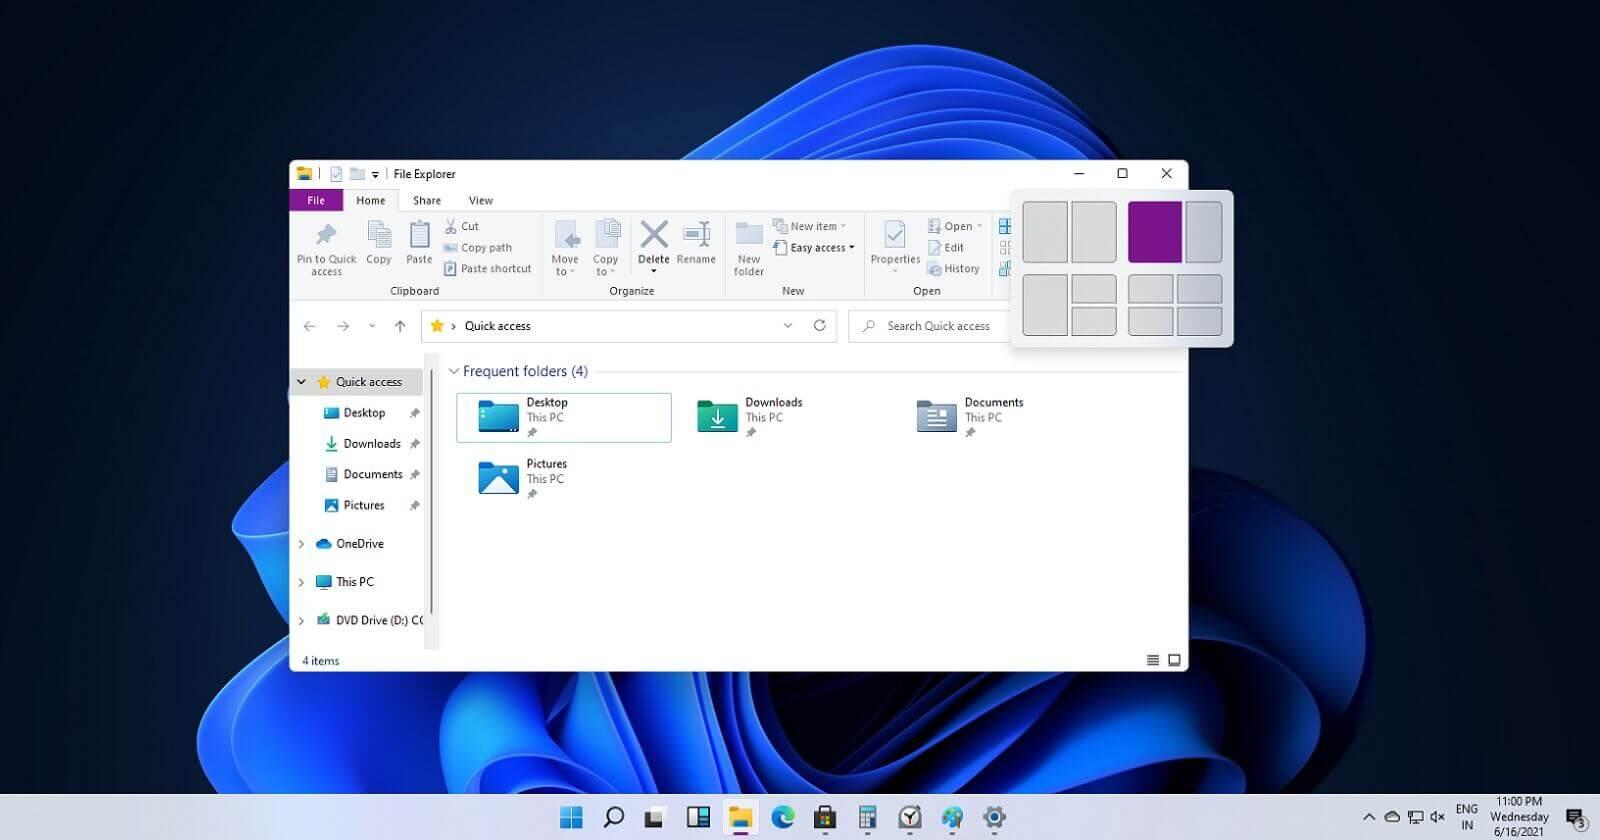 Windows 11 snap controls